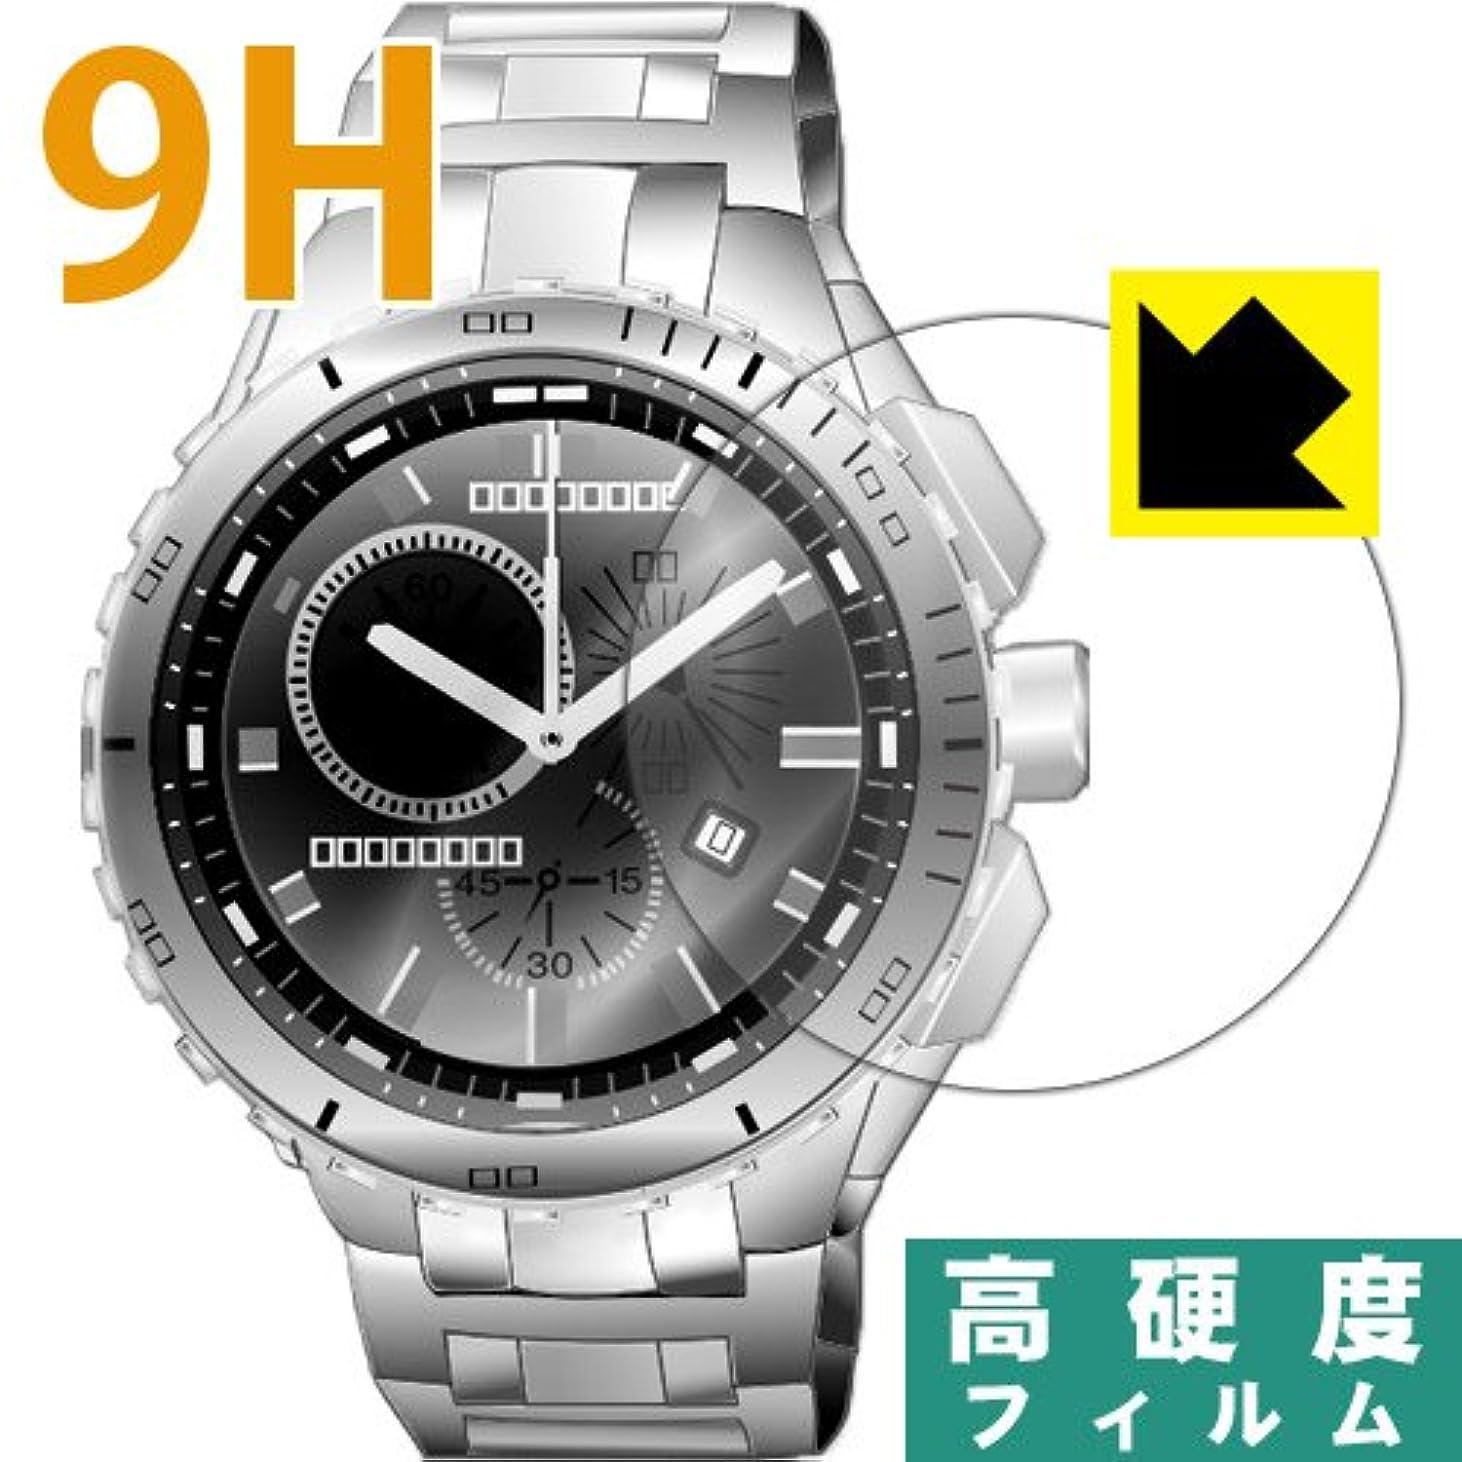 9H高硬度[光沢]保護フィルム 時計用液晶保護フィルム 日本製 ~9H高硬度~ (36mm)